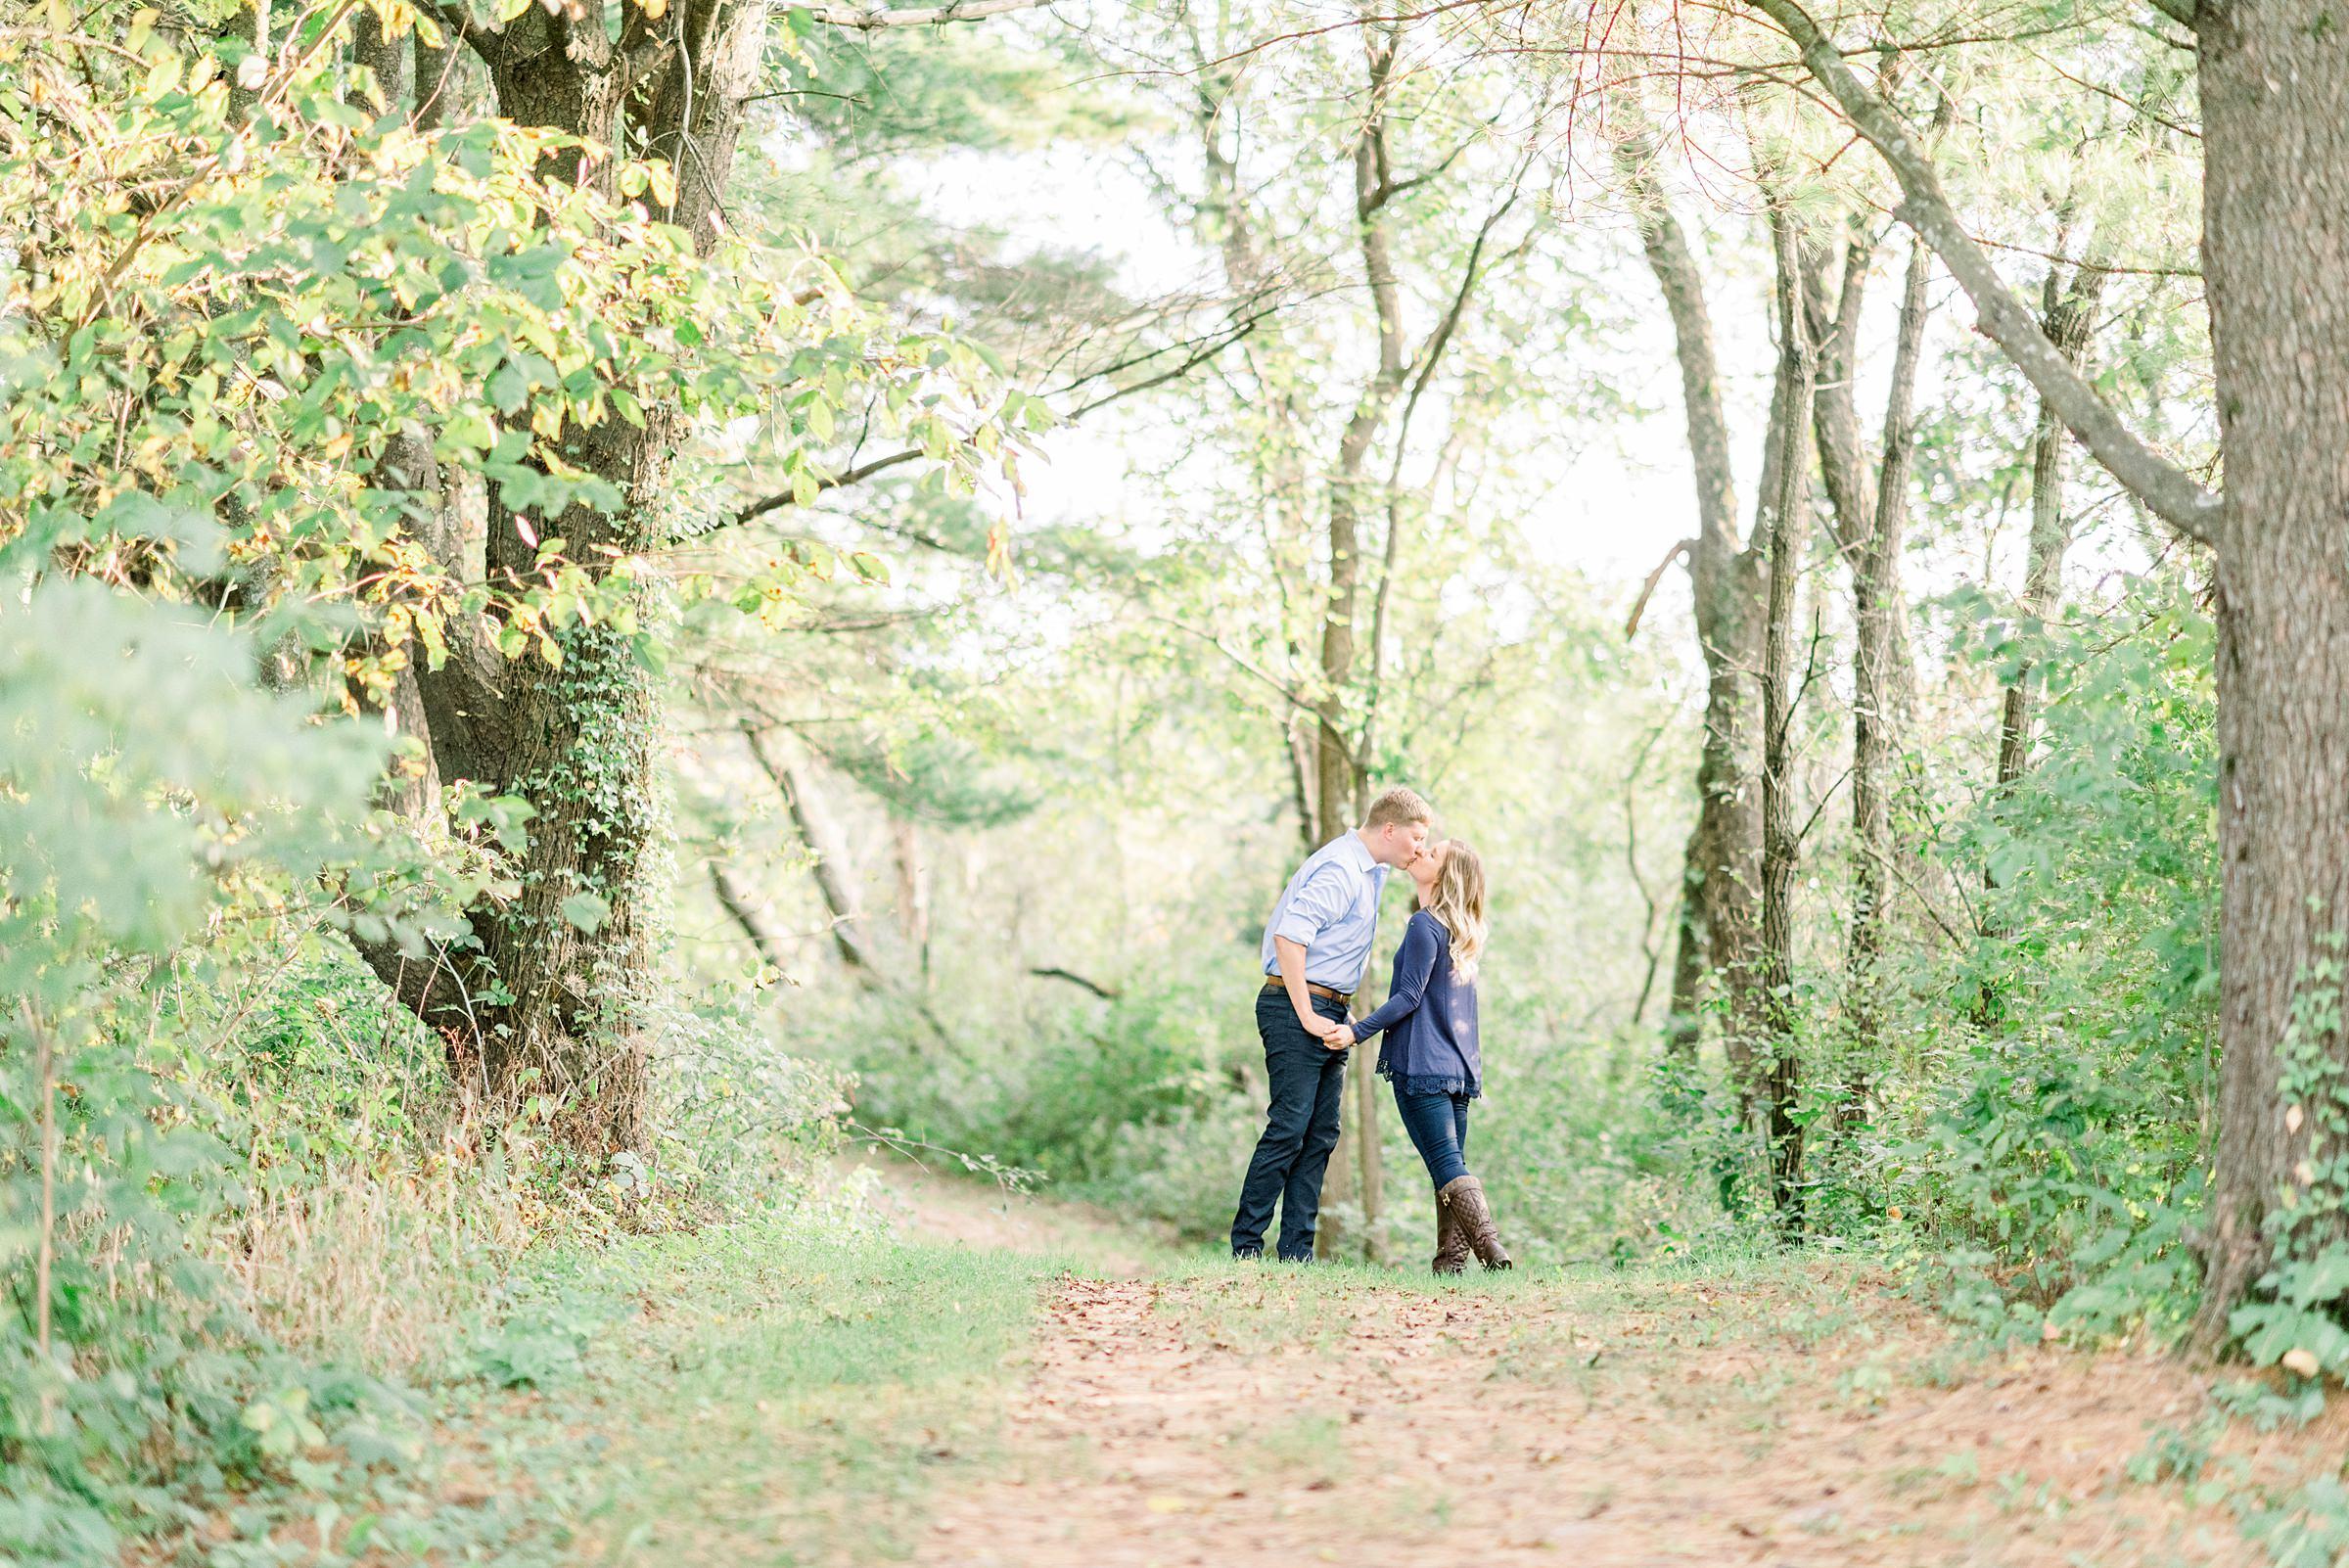 Mount Horeb, WI Engagement Session - Larissa Marie Photography